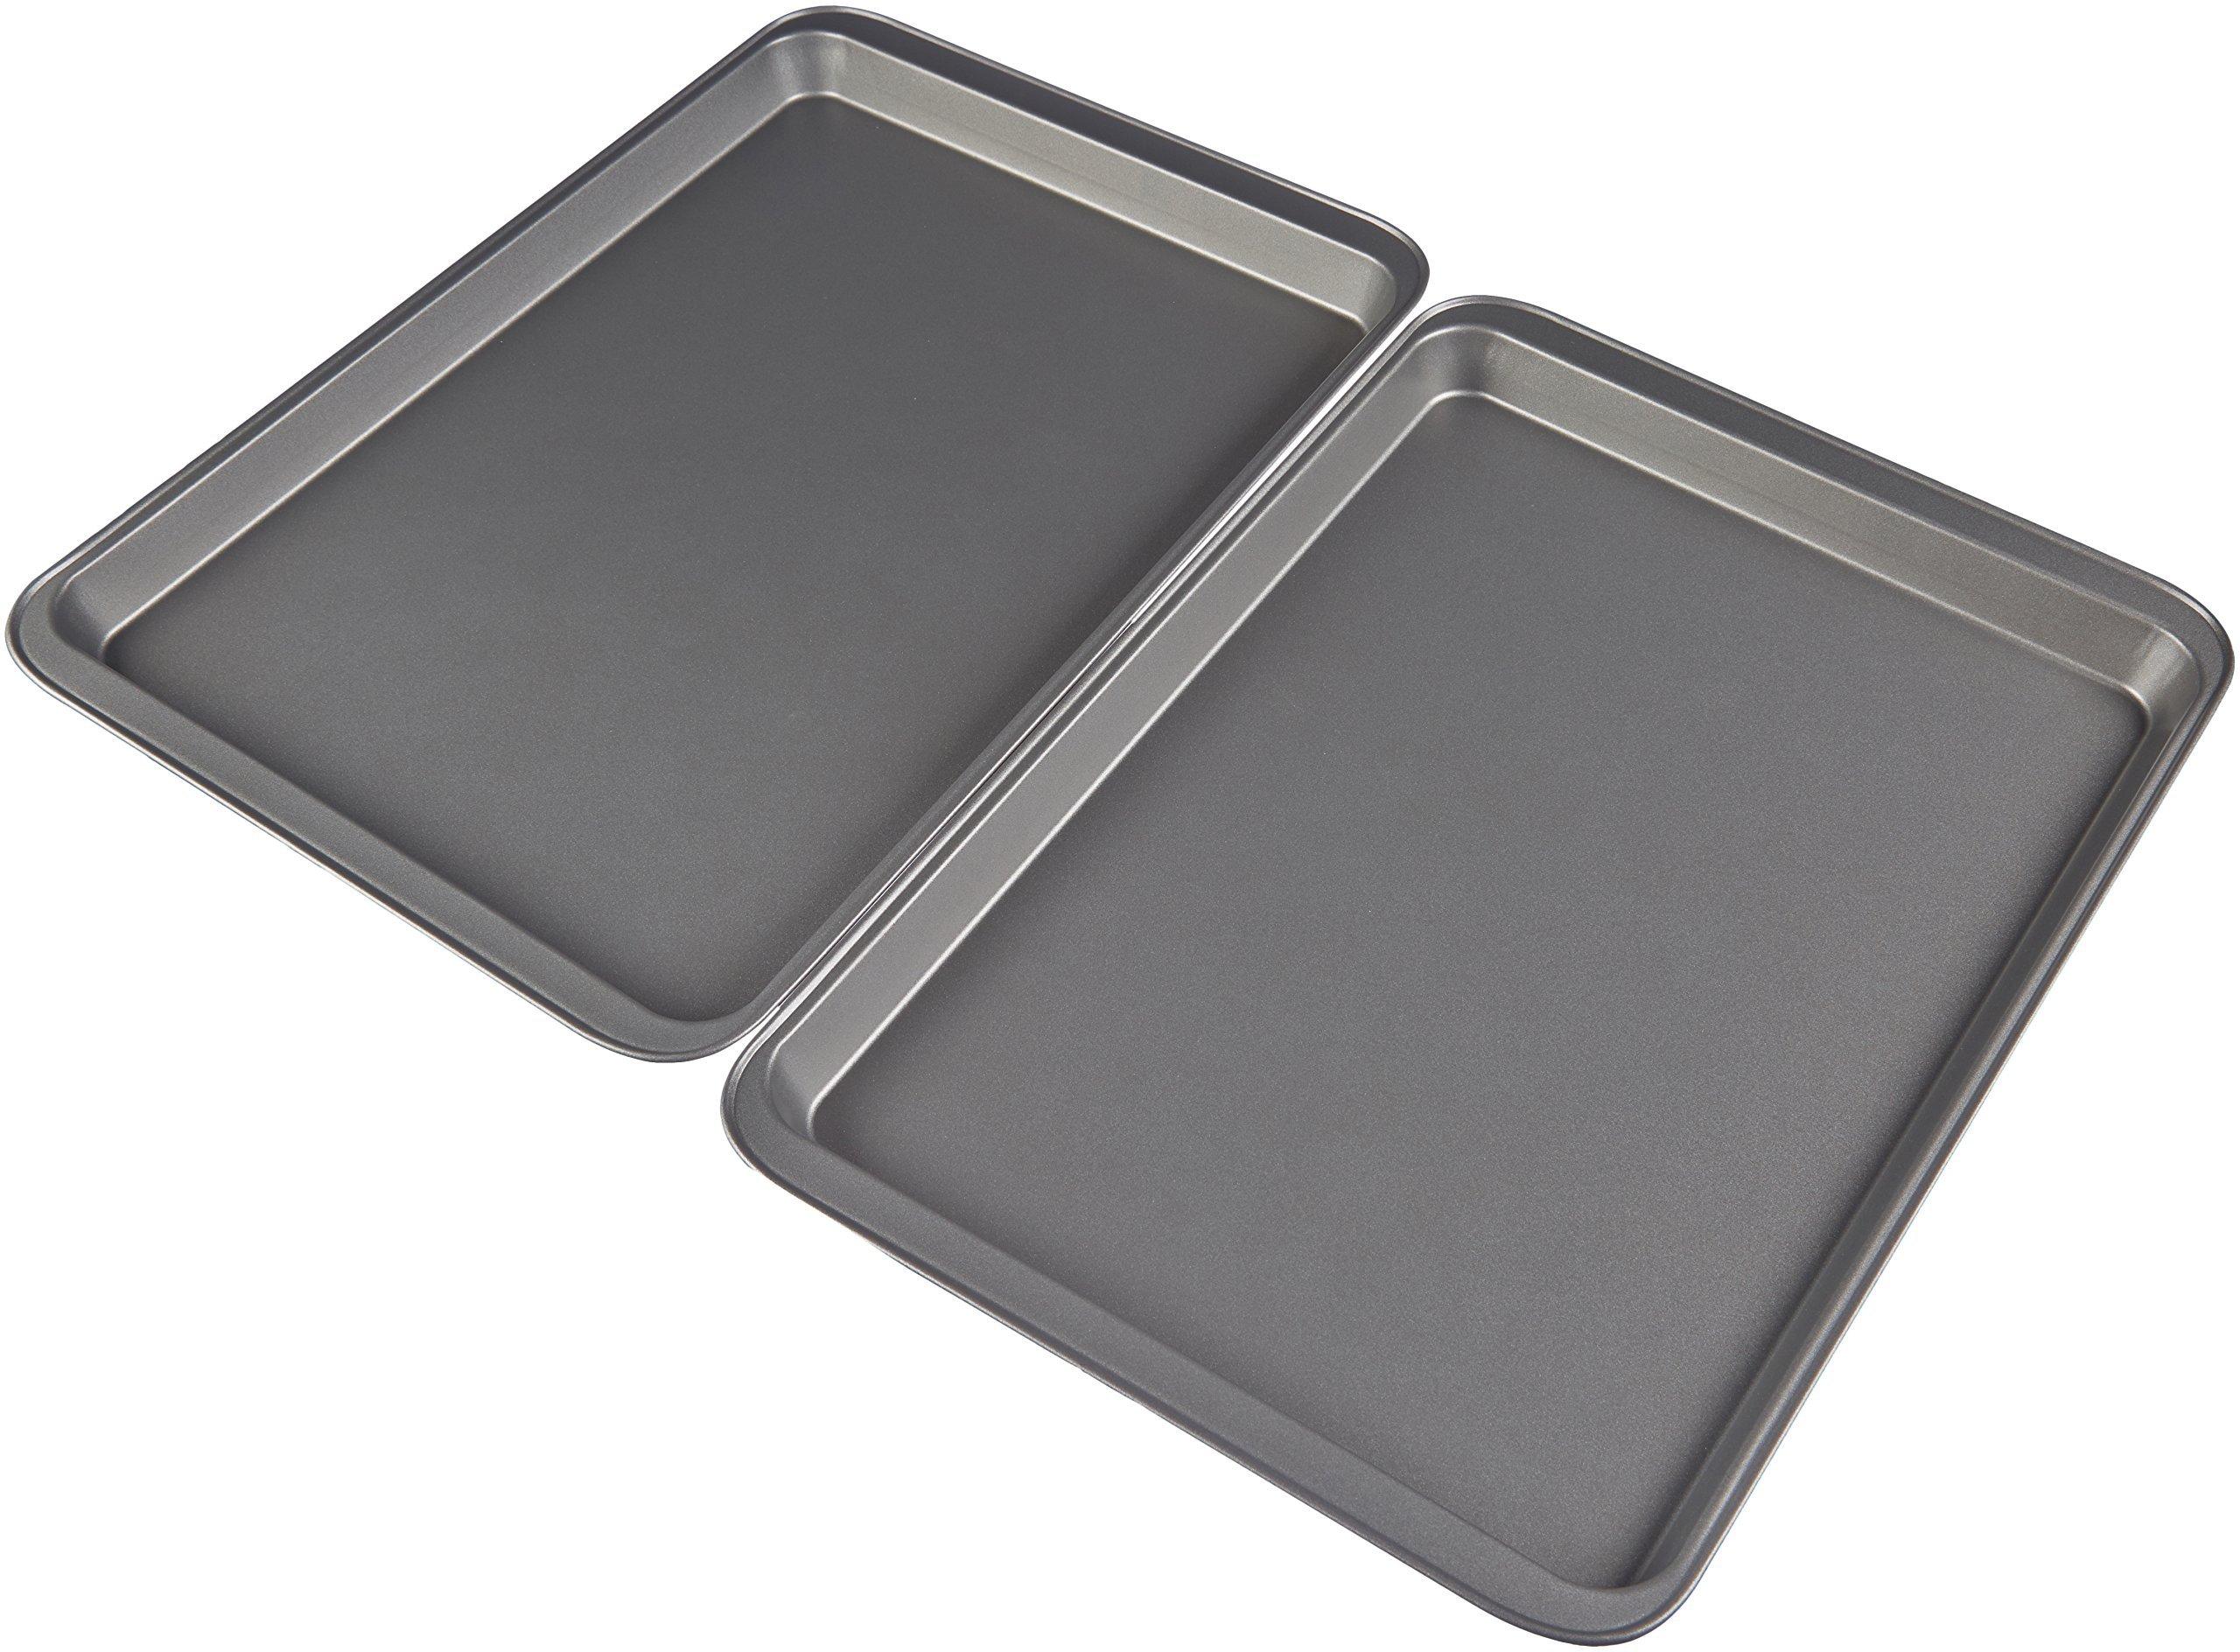 AmazonBasics Nonstick Carbon Steel Half Baking Sheet - 2-Pack by AmazonBasics